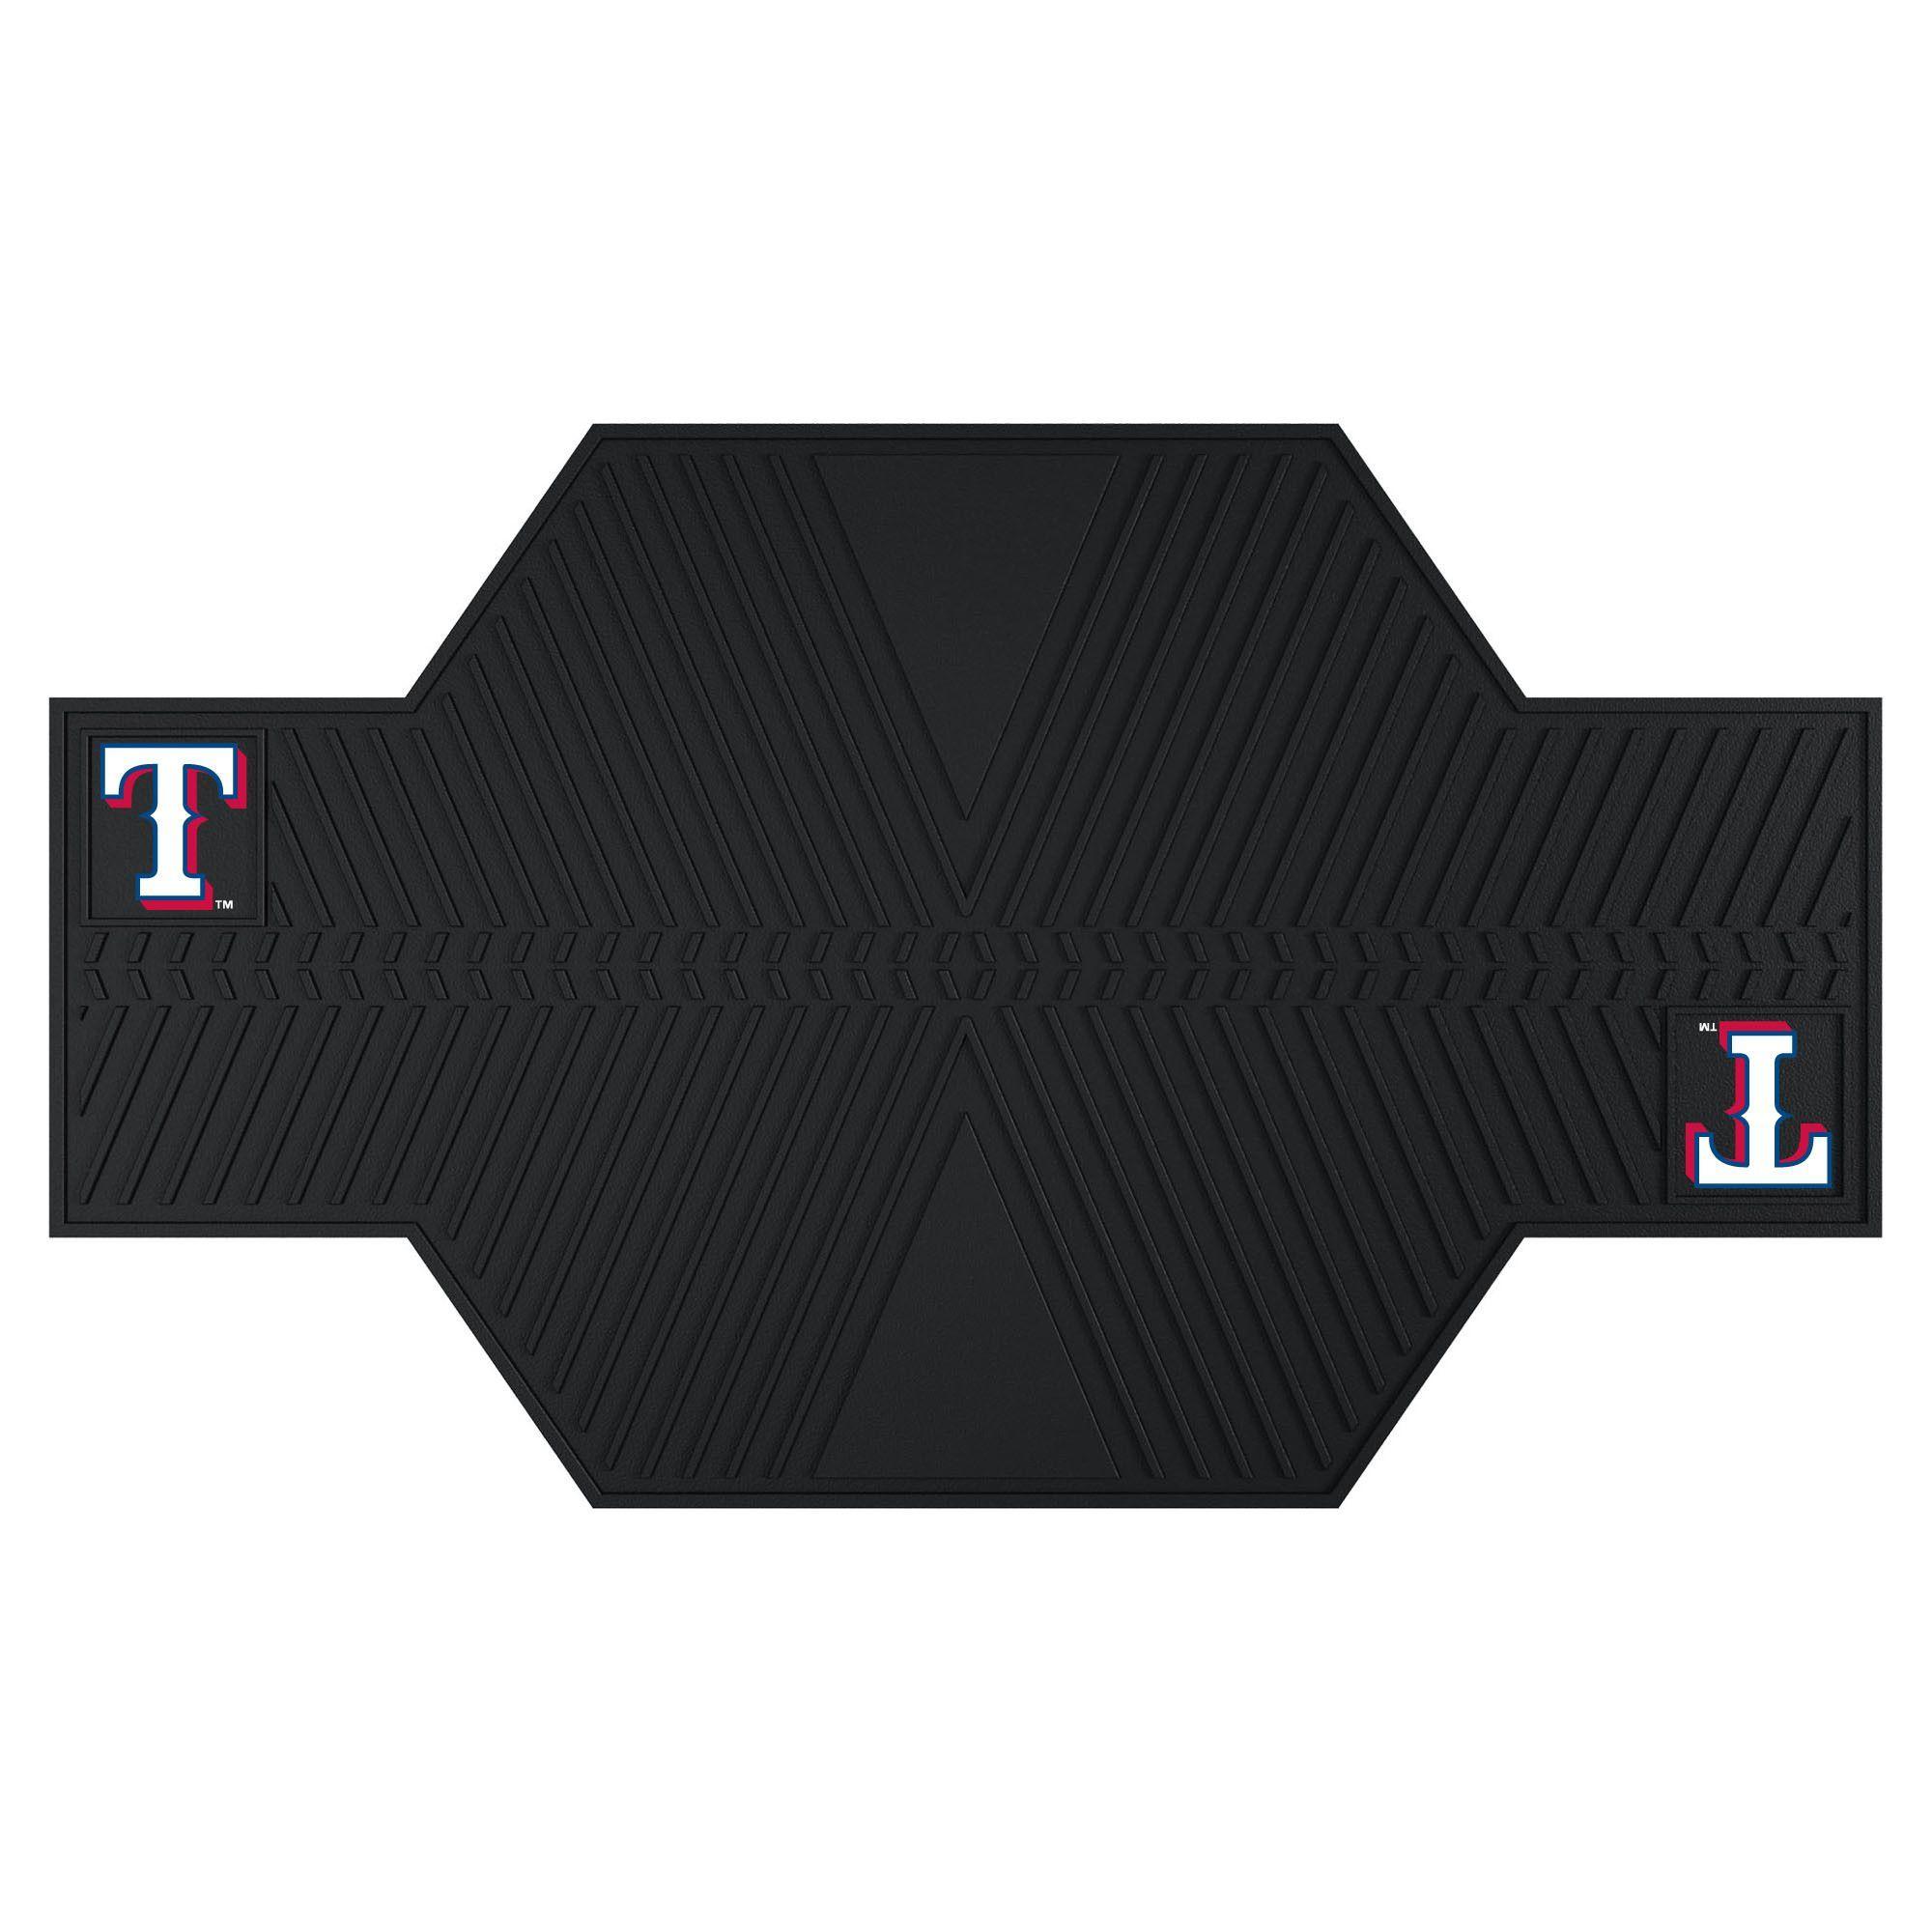 MLB - Texas Rangers Motorcycle Mat